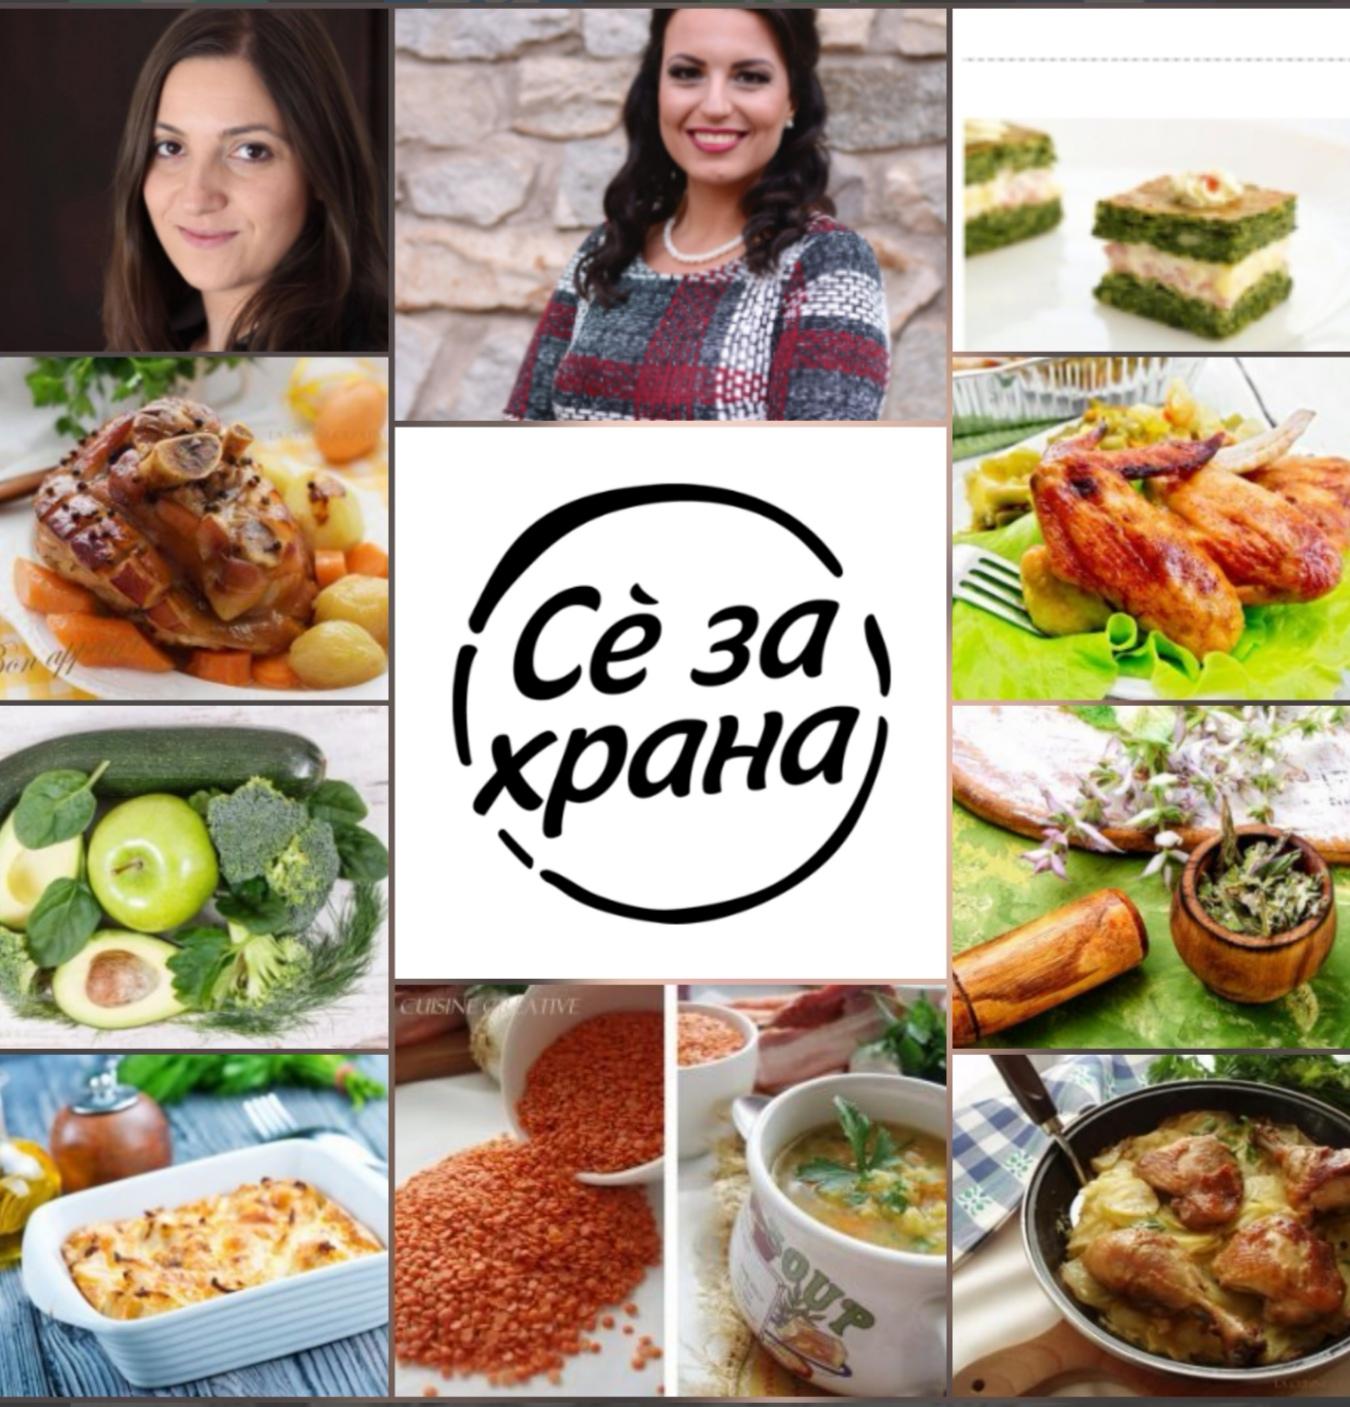 """Сѐ за храна"" онлајн магазин за вкусна храна и рецепти, креација на две наши битолчанки"